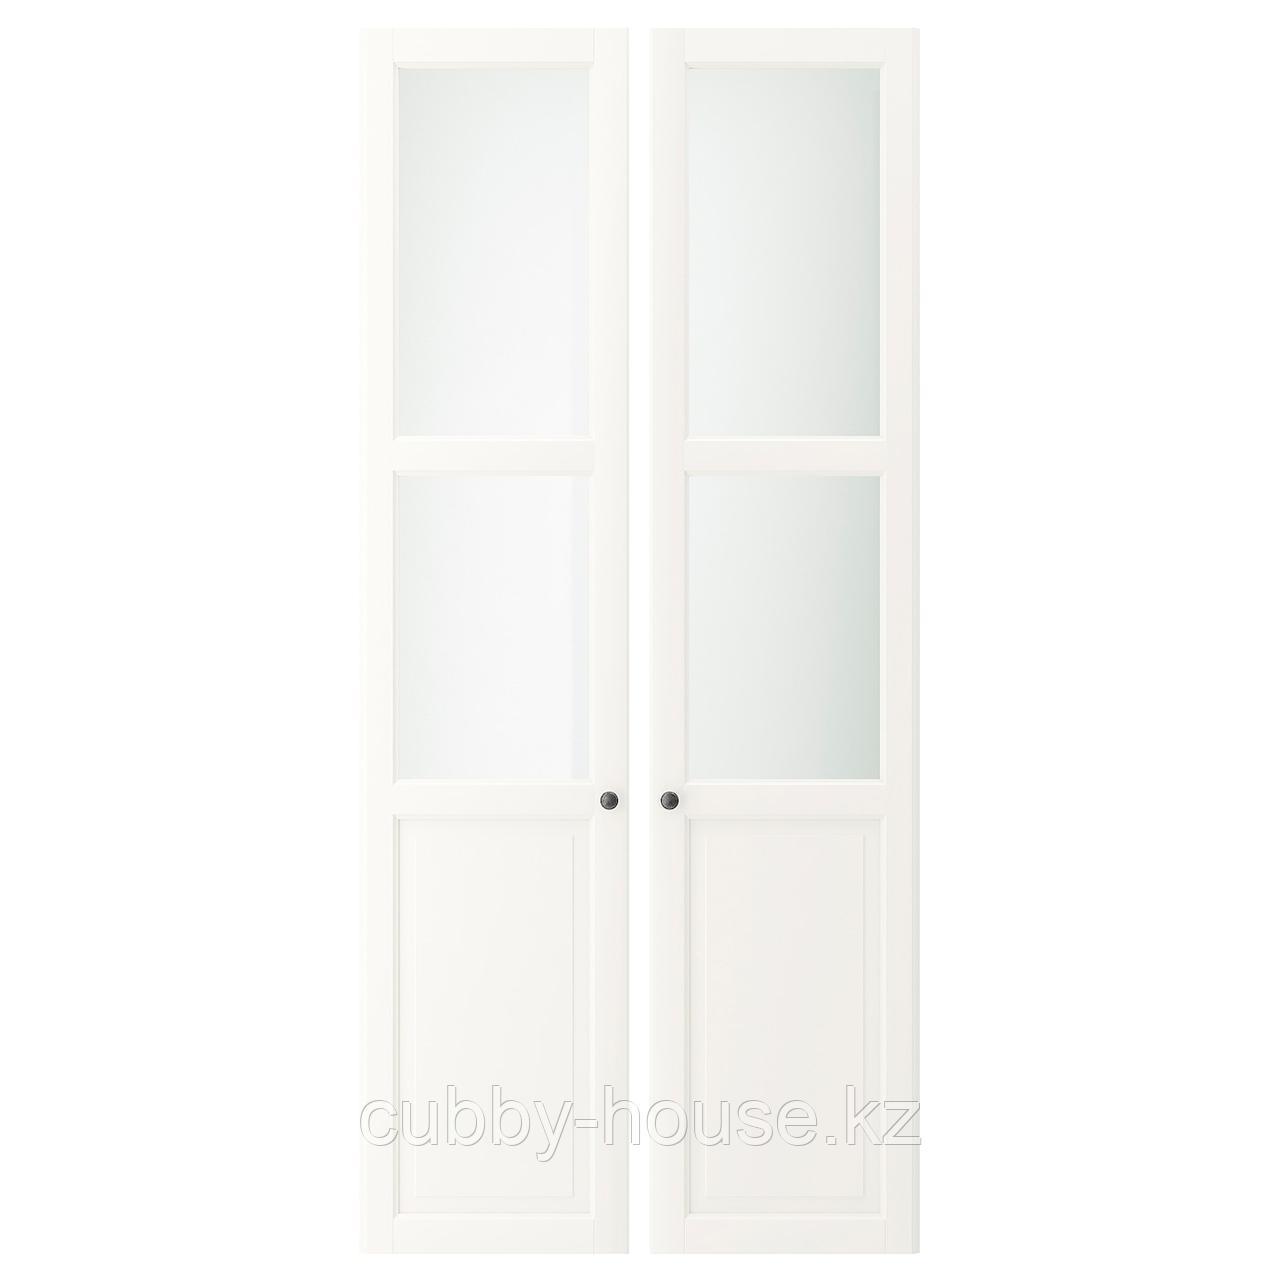 ЛИАТОРП Панельн/стеклян дверца, белый, 44x198 см